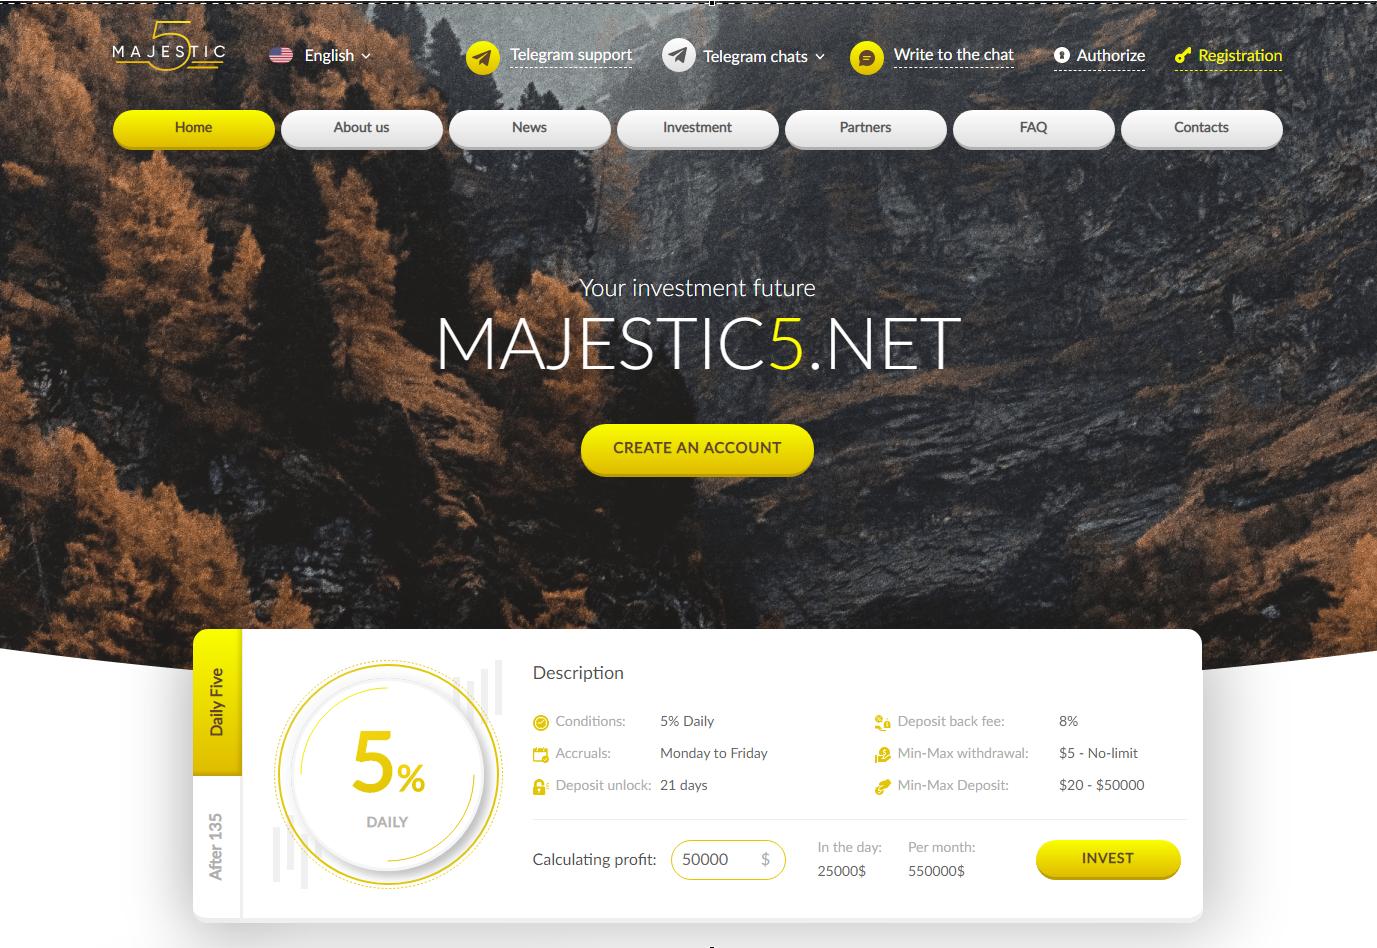 Majestic Five Limited